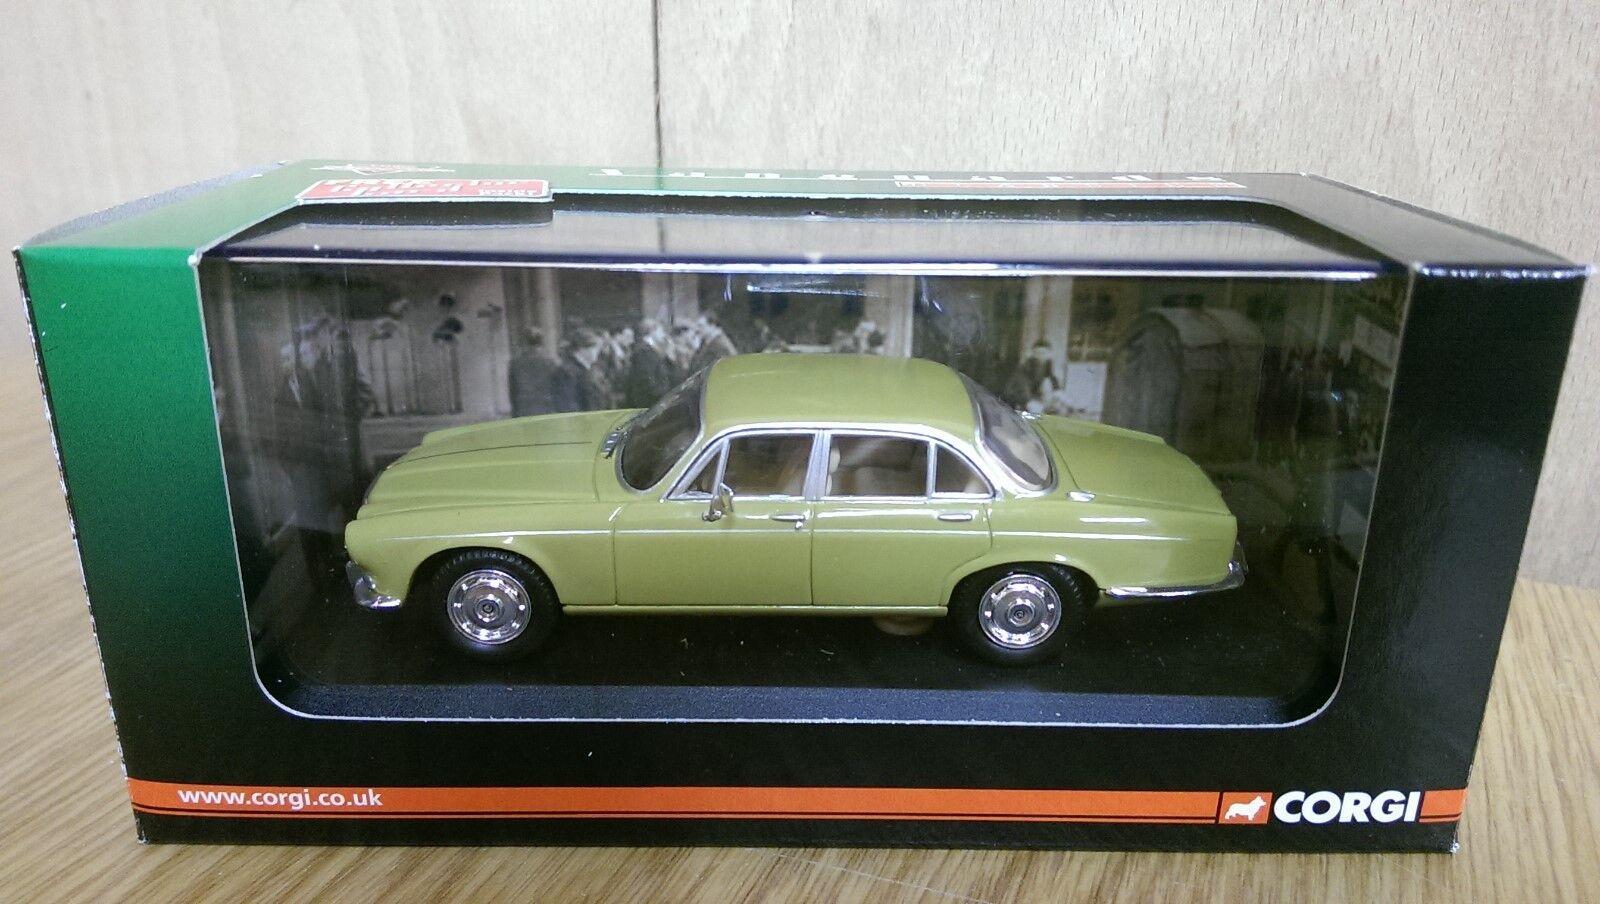 Corgi VA08804 Daimler Sovereign Greensand Ltd Edition No. 0002 of 2460